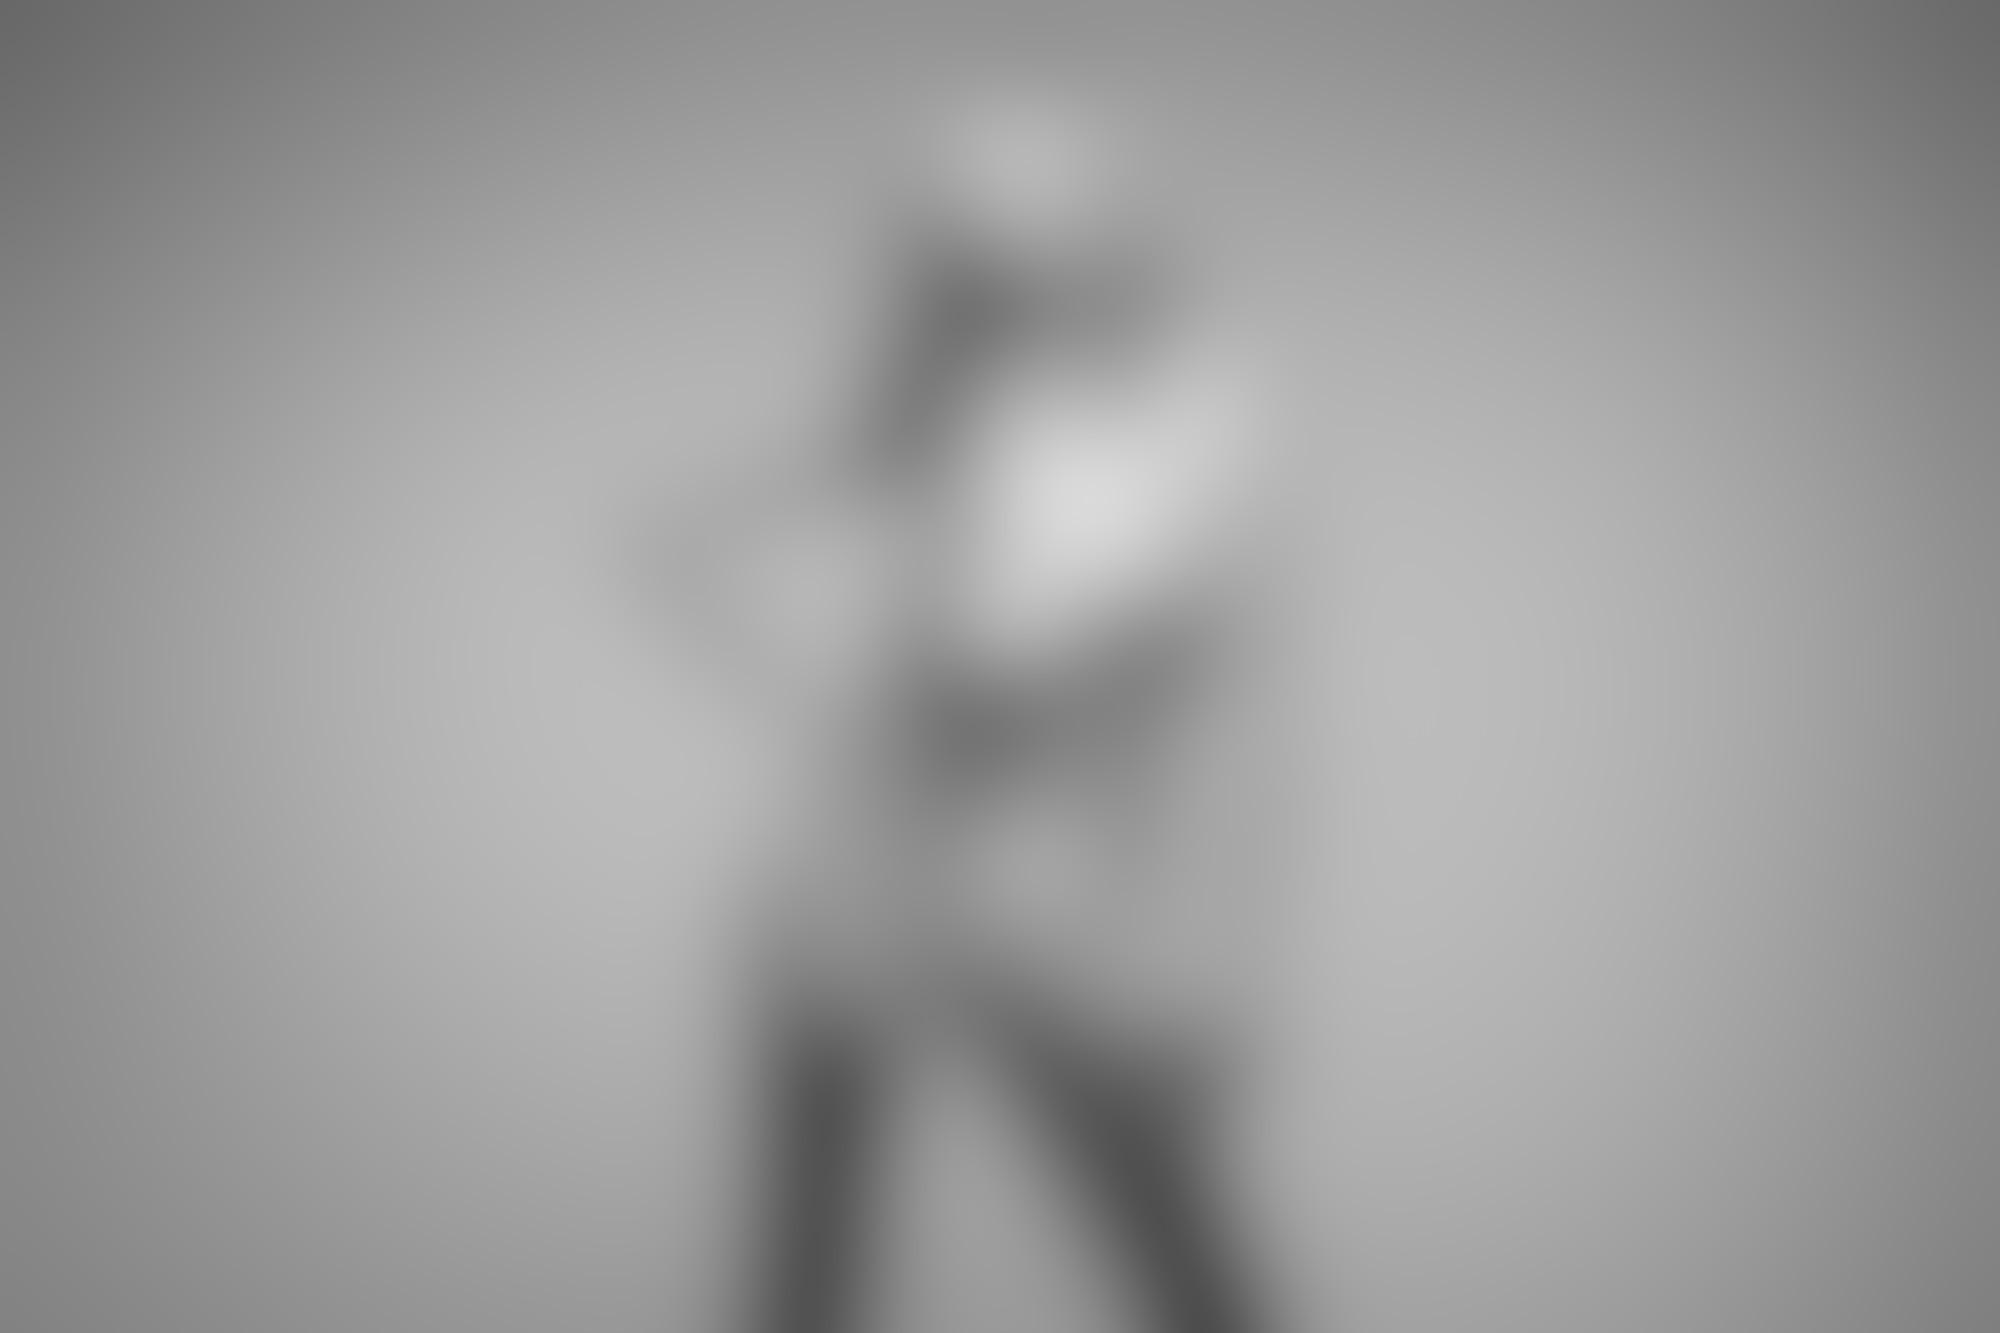 MM Kate Moss xx large 2e4410727e7cbf4c1e7054cc492261f1 autocompressfitresizeixlibphp 1 1 0max h2000max w3 D2000q80sf575b13bcb2b6ee64ec4f54689a74fa5